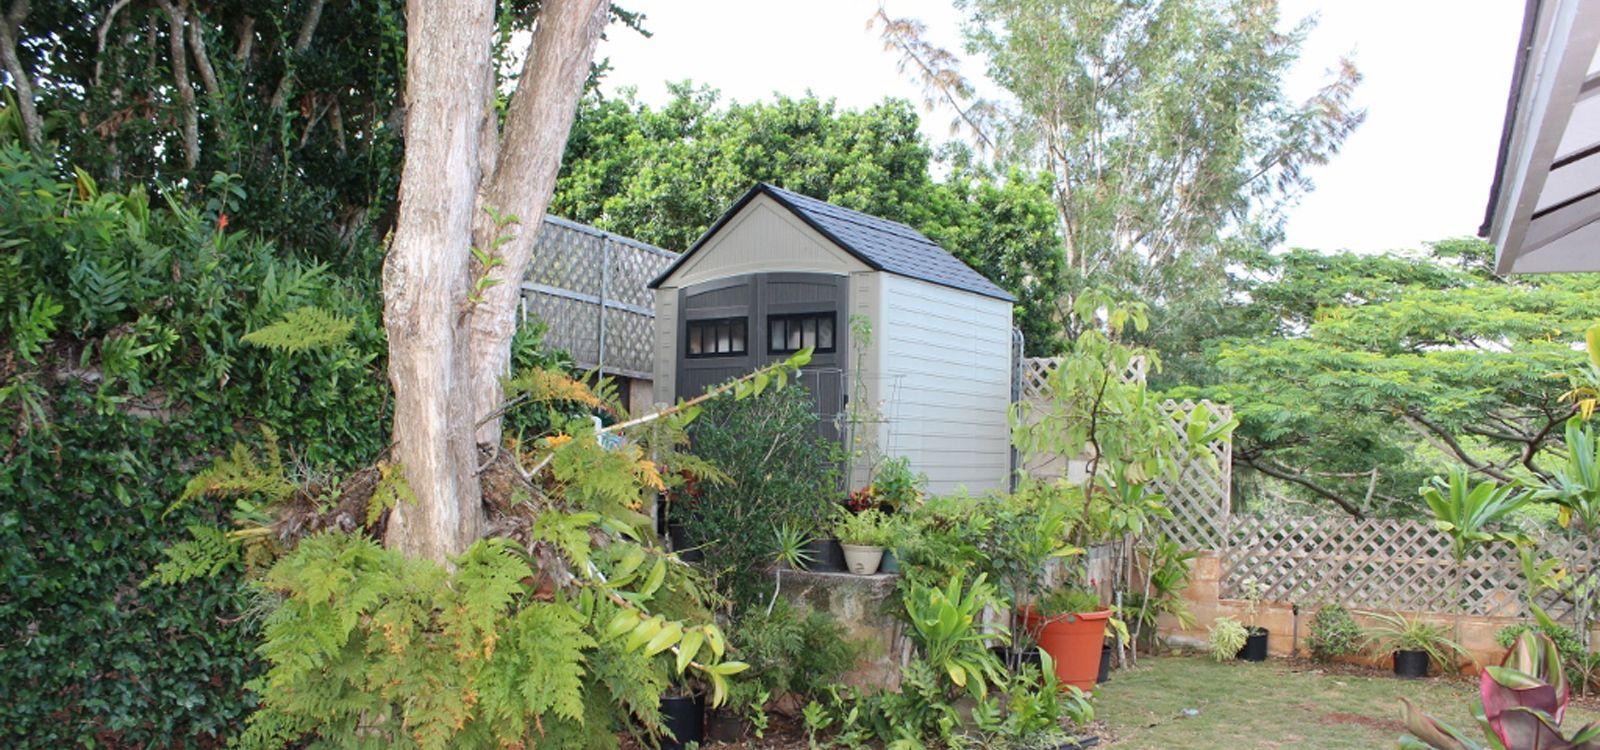 Listing mililani single family perimeter home image by